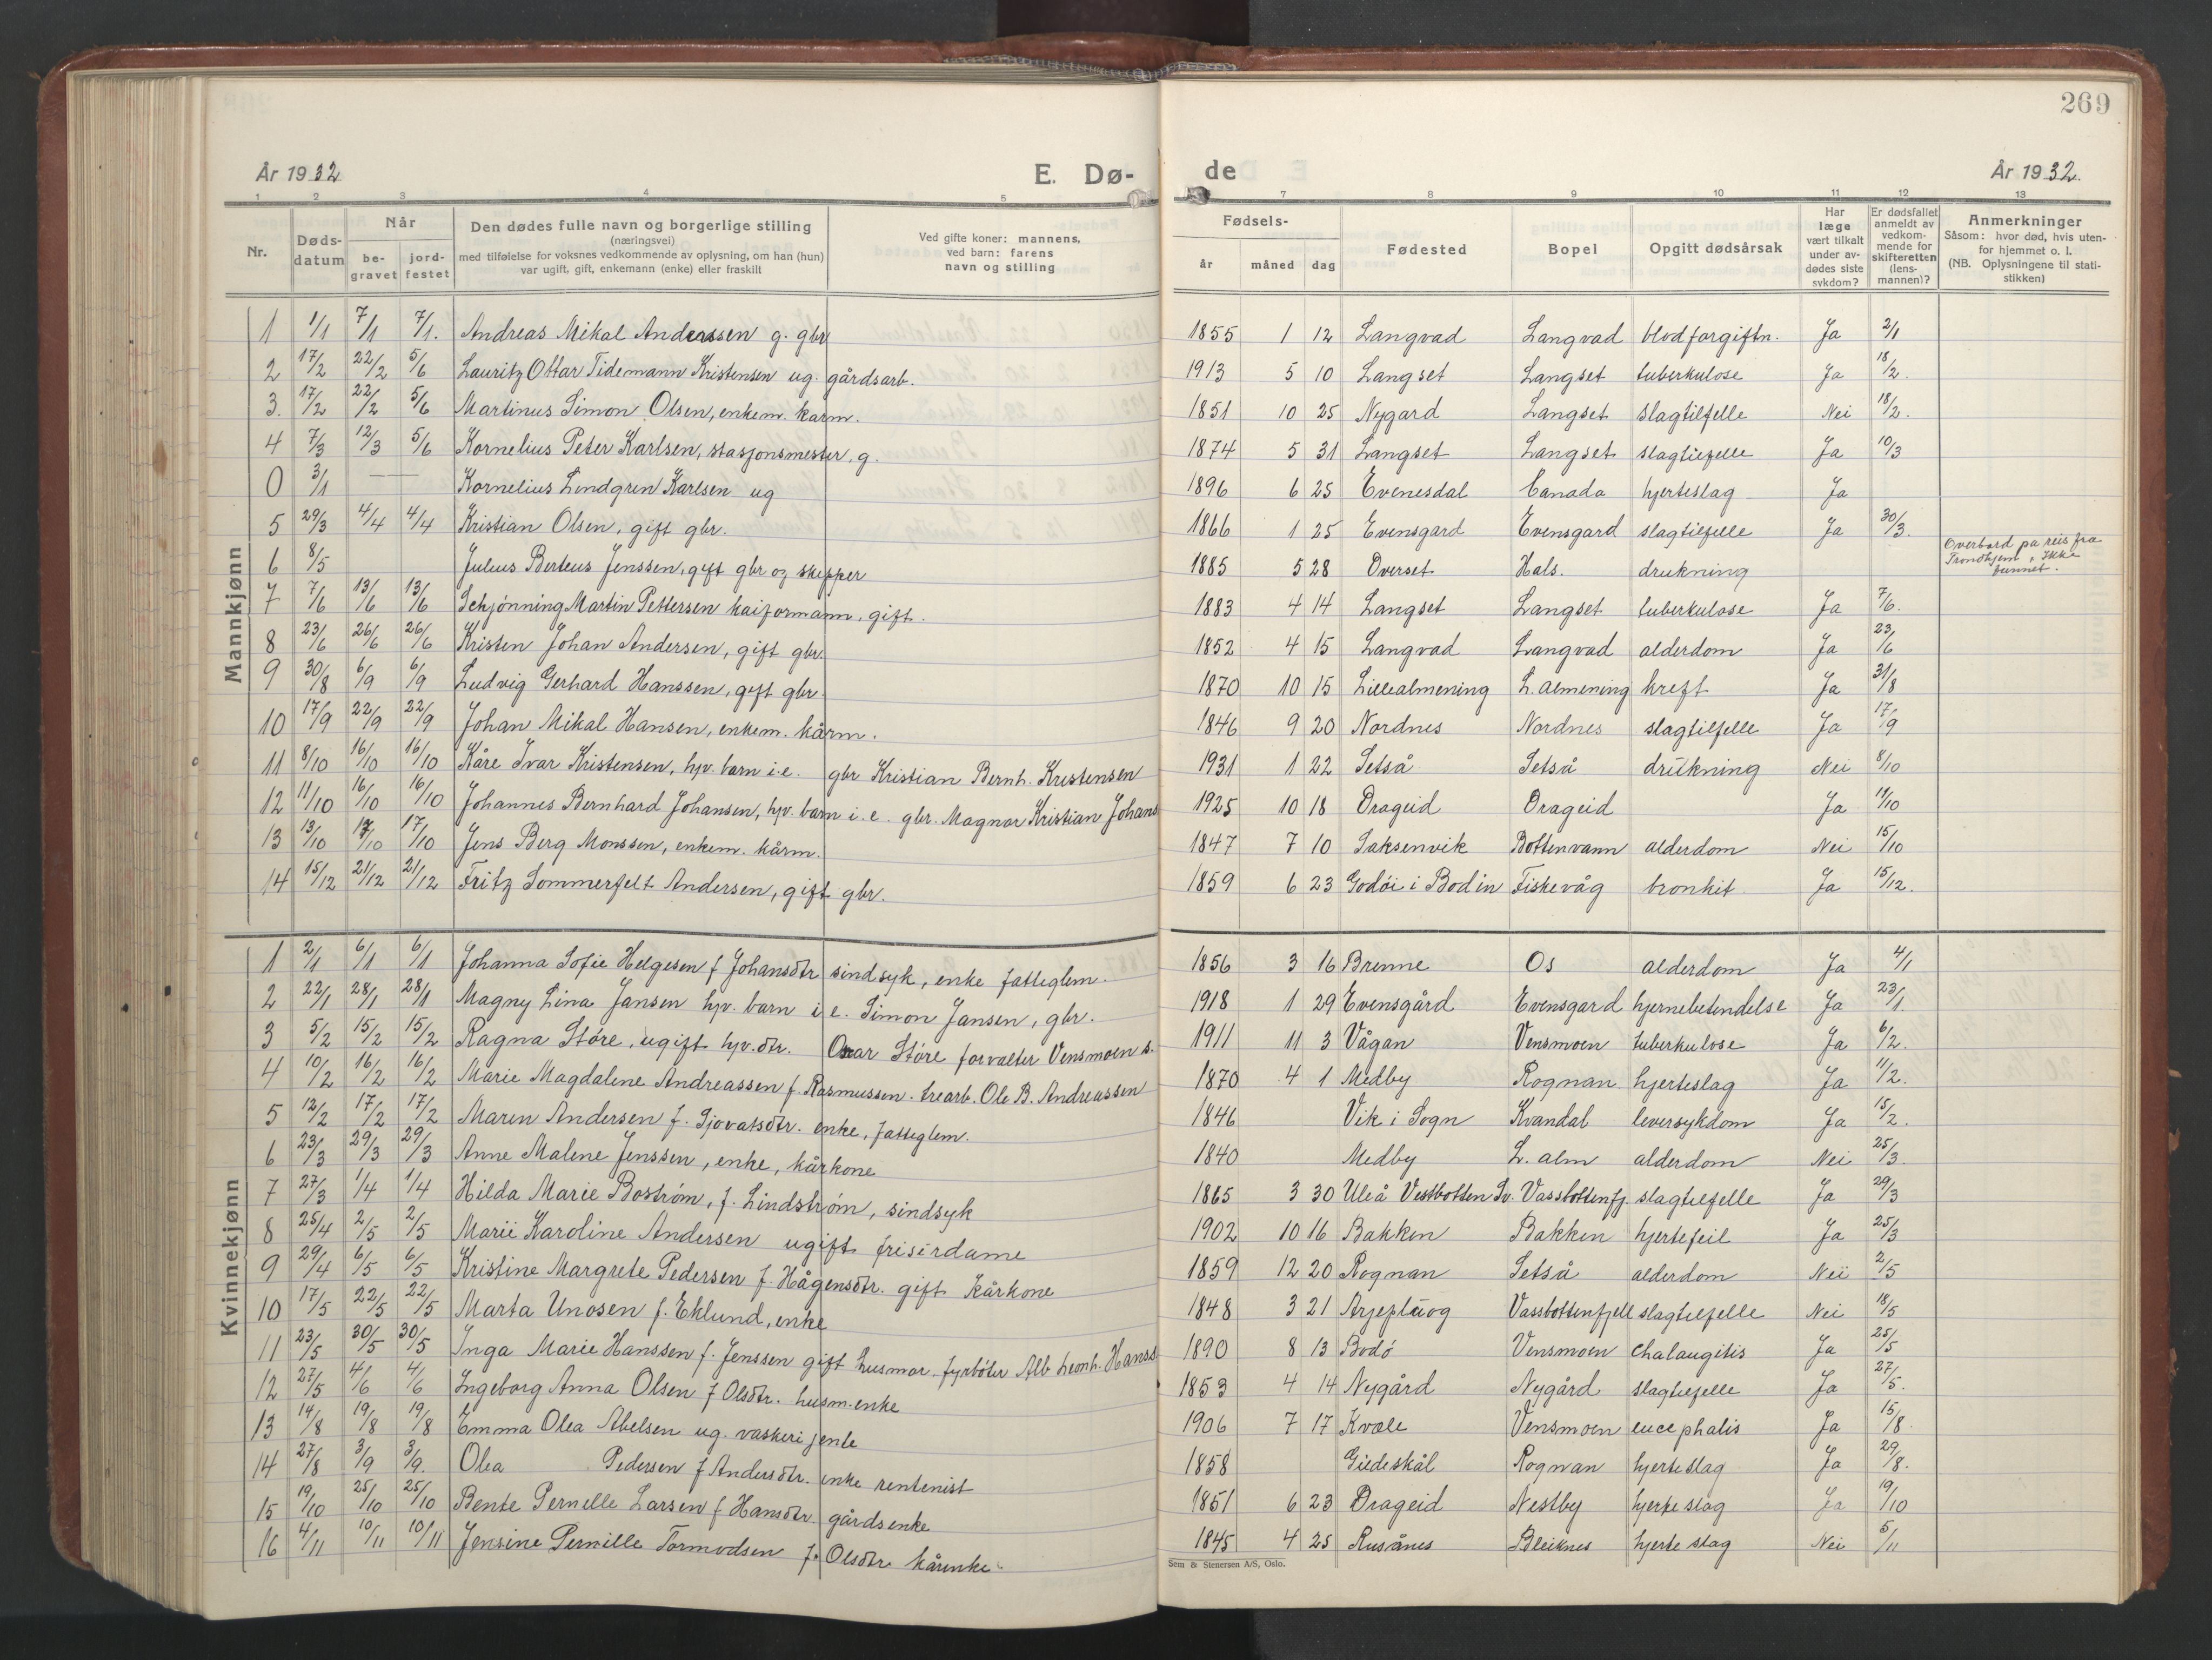 SAT, Ministerialprotokoller, klokkerbøker og fødselsregistre - Nordland, 847/L0680: Klokkerbok nr. 847C08, 1930-1947, s. 269